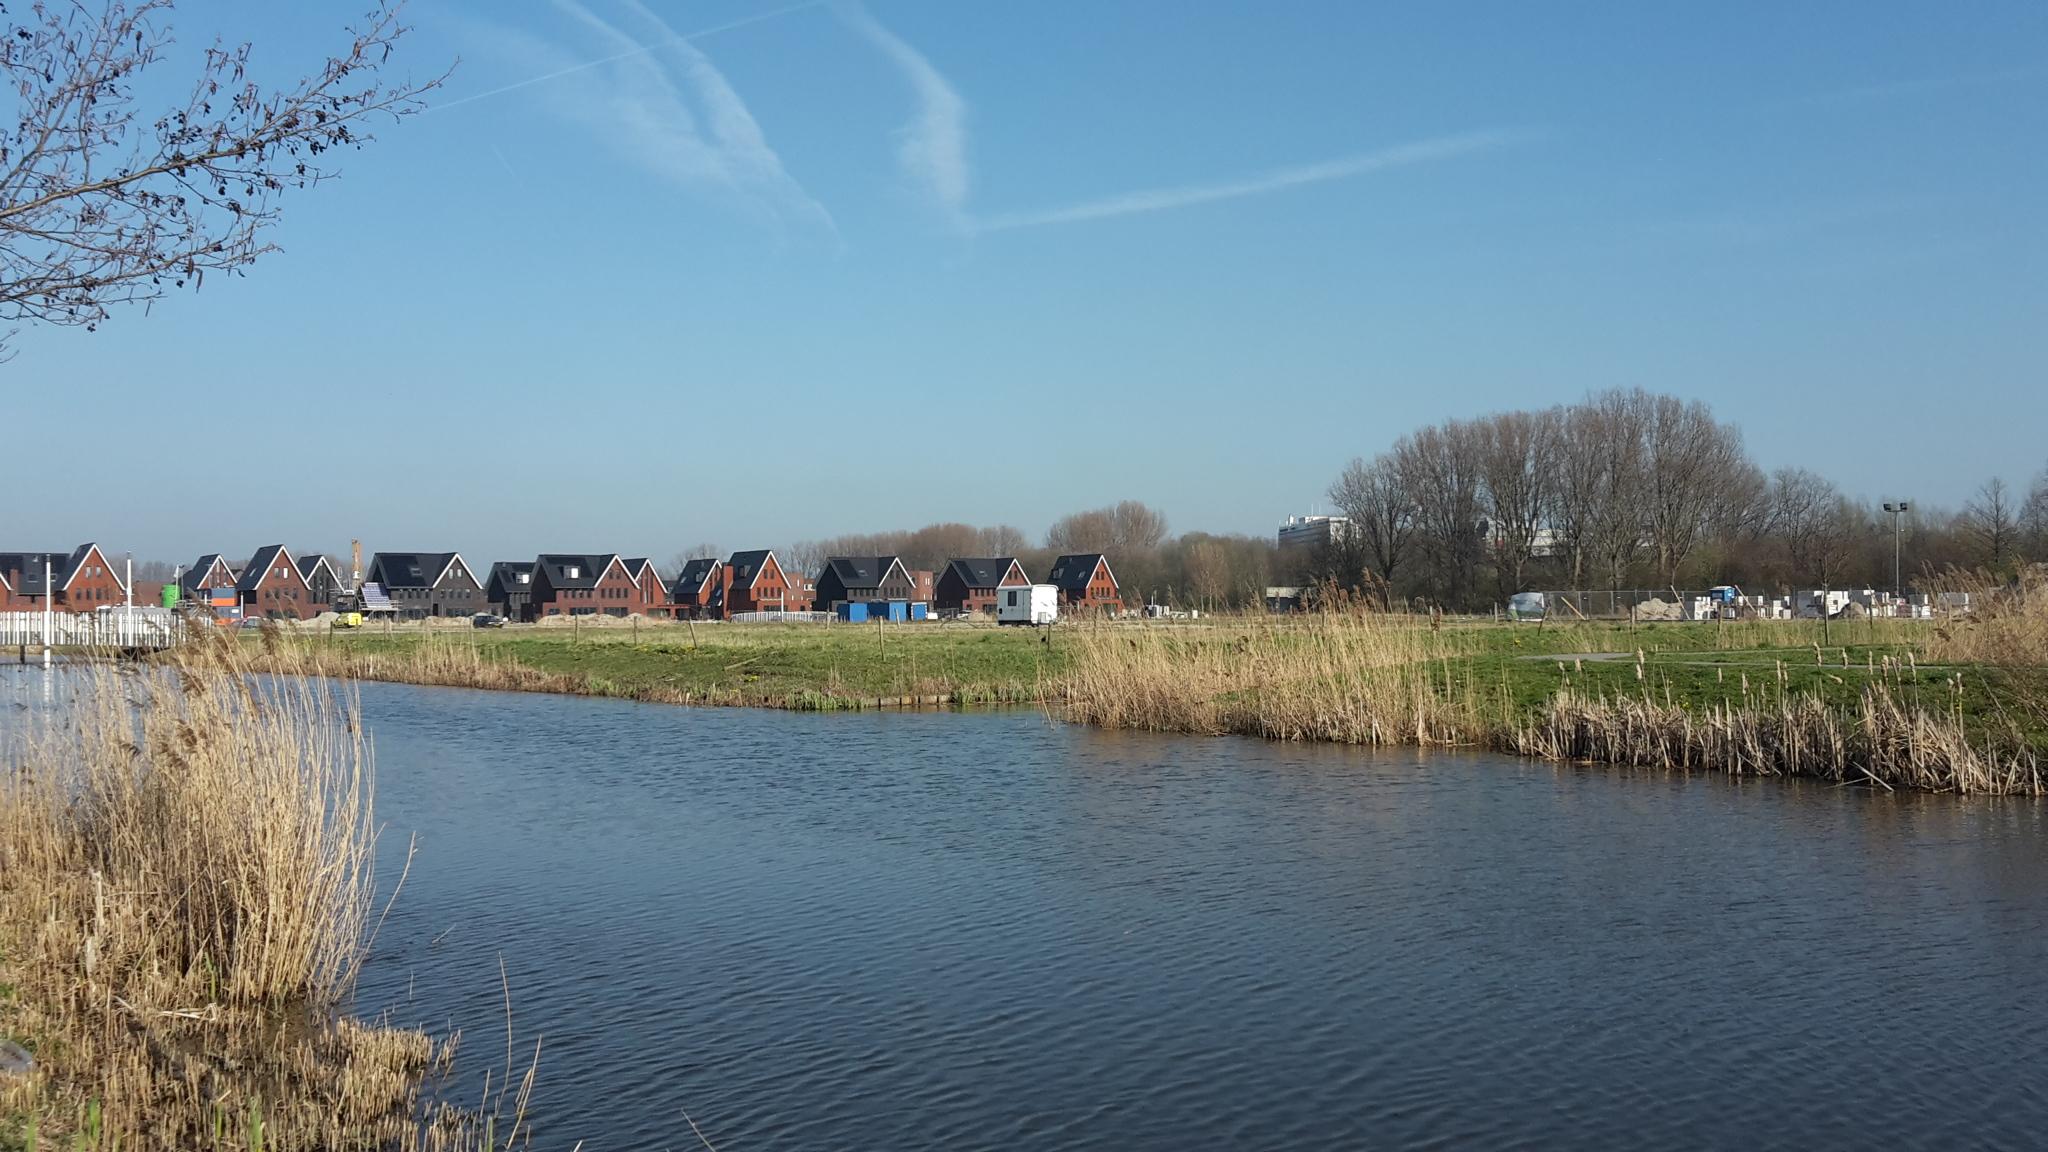 kavels park 16hoven rotterdam riethoven leeuwenhoekhof beekweg rietzoom